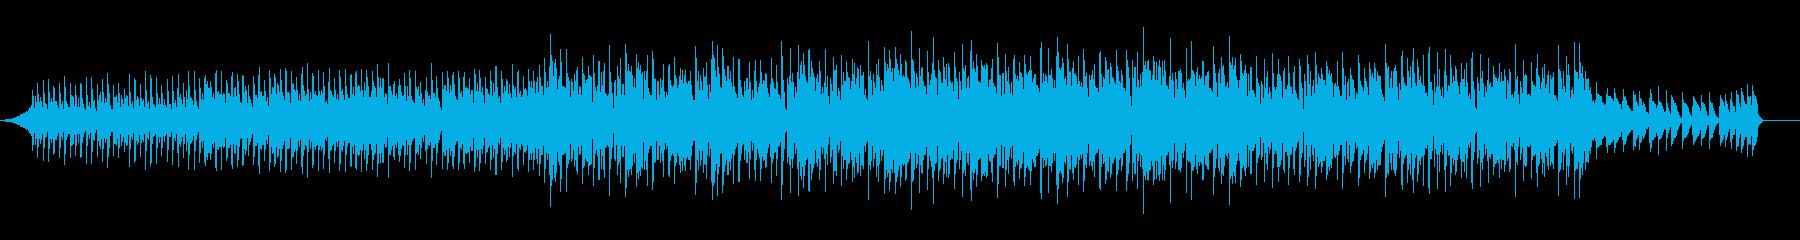 M1ピアノのダンスミュージックの再生済みの波形